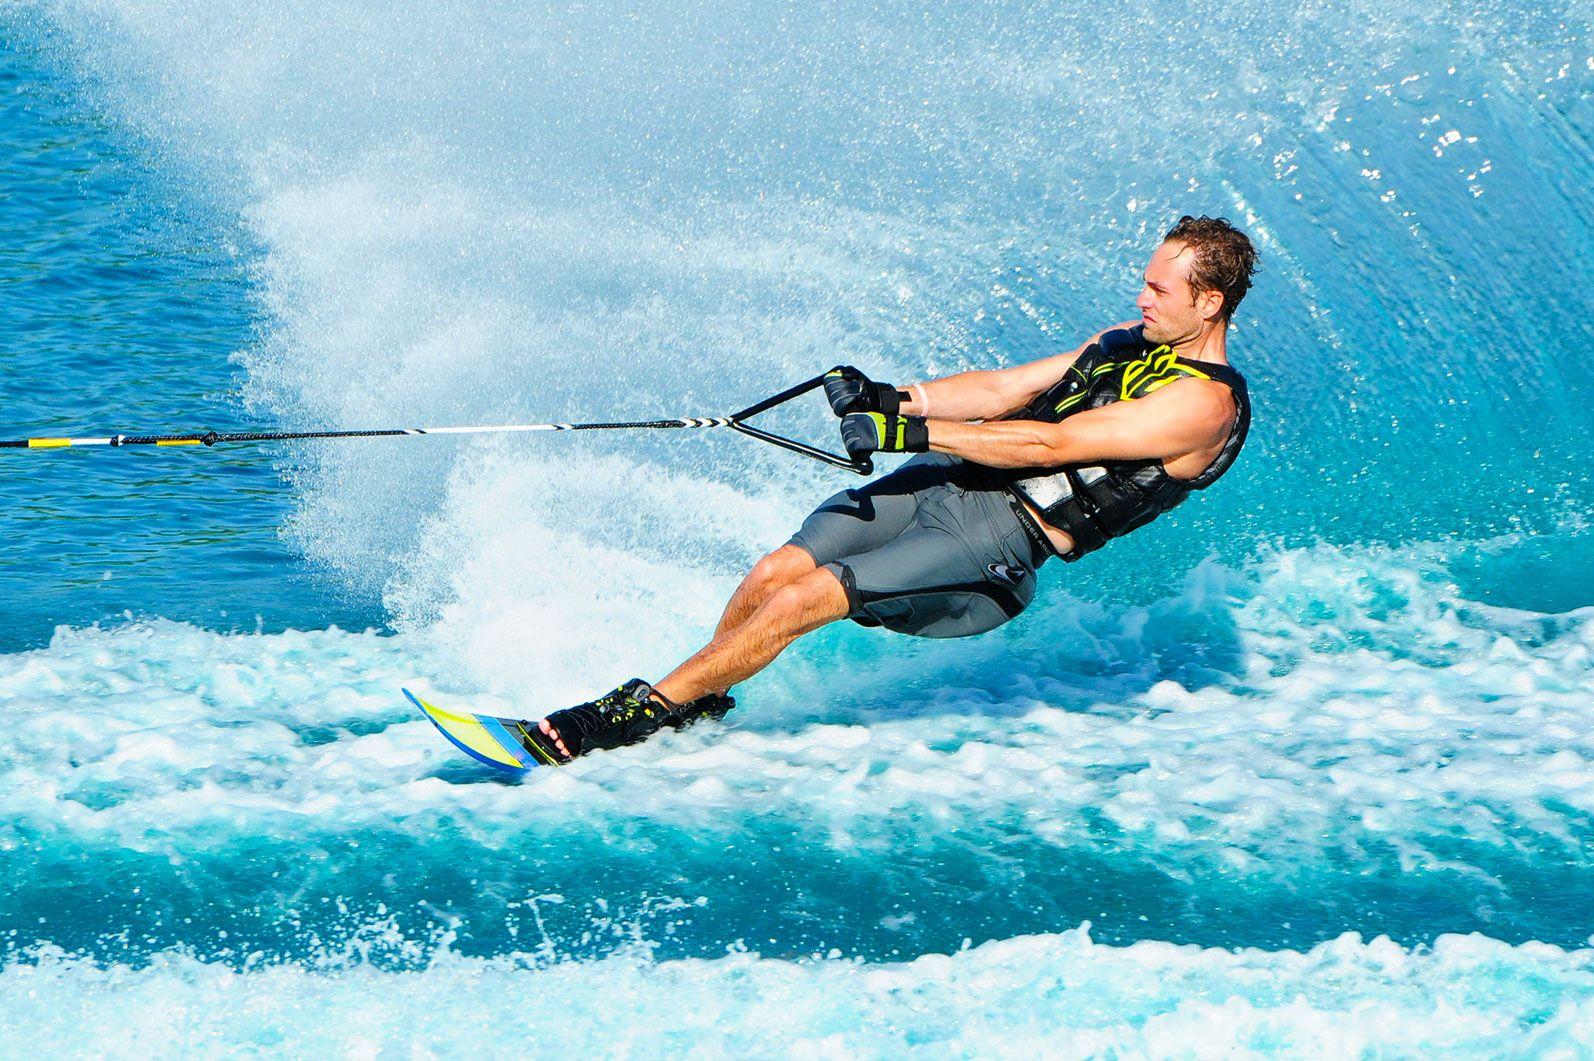 Jet ski fly fish water sports discover ras al khaimah